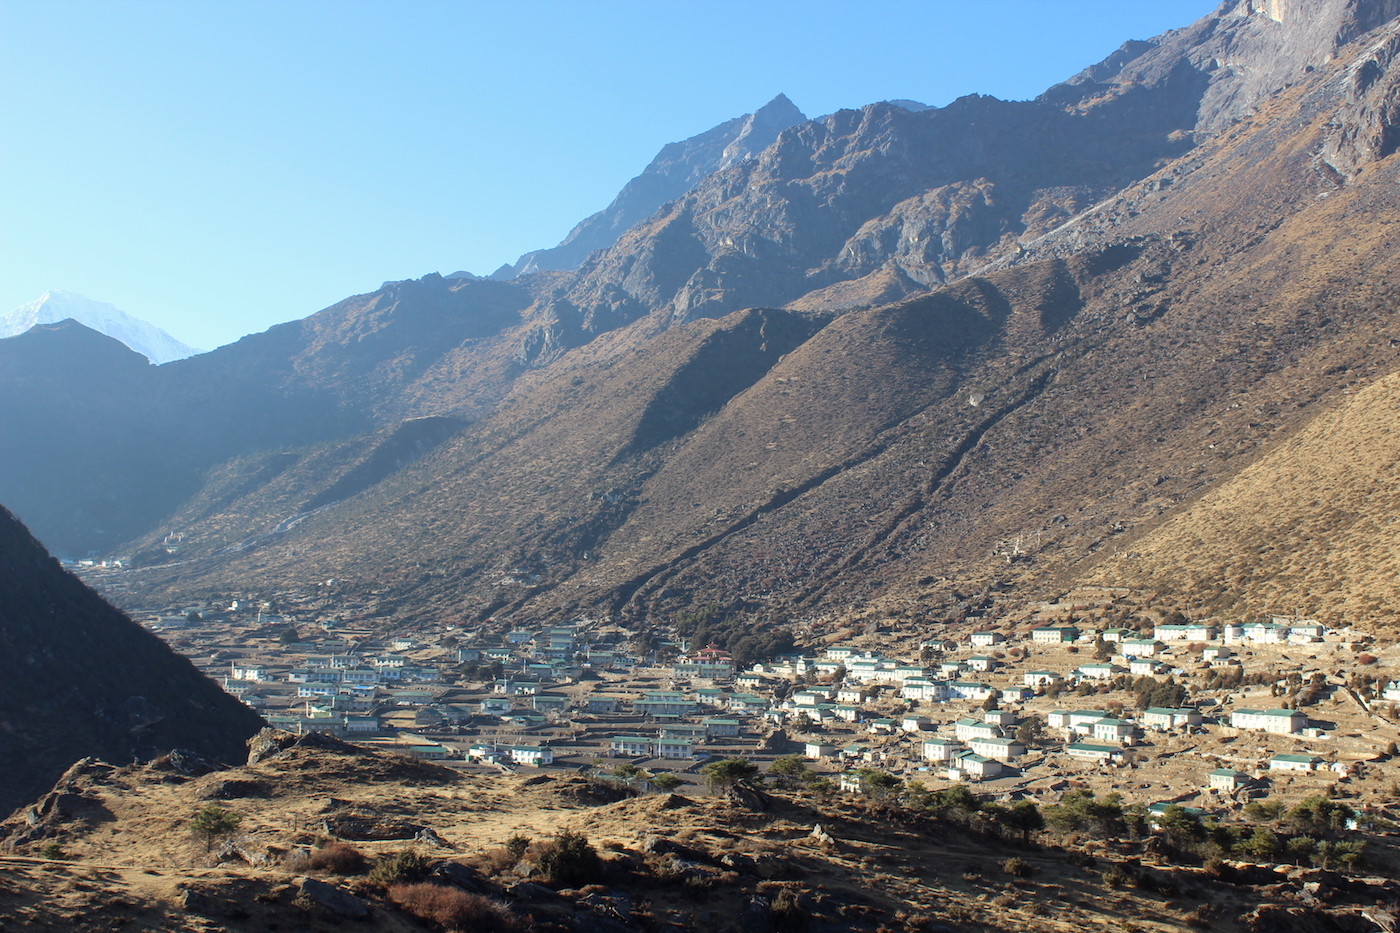 Khumjung Village Beyul Travel and Treks